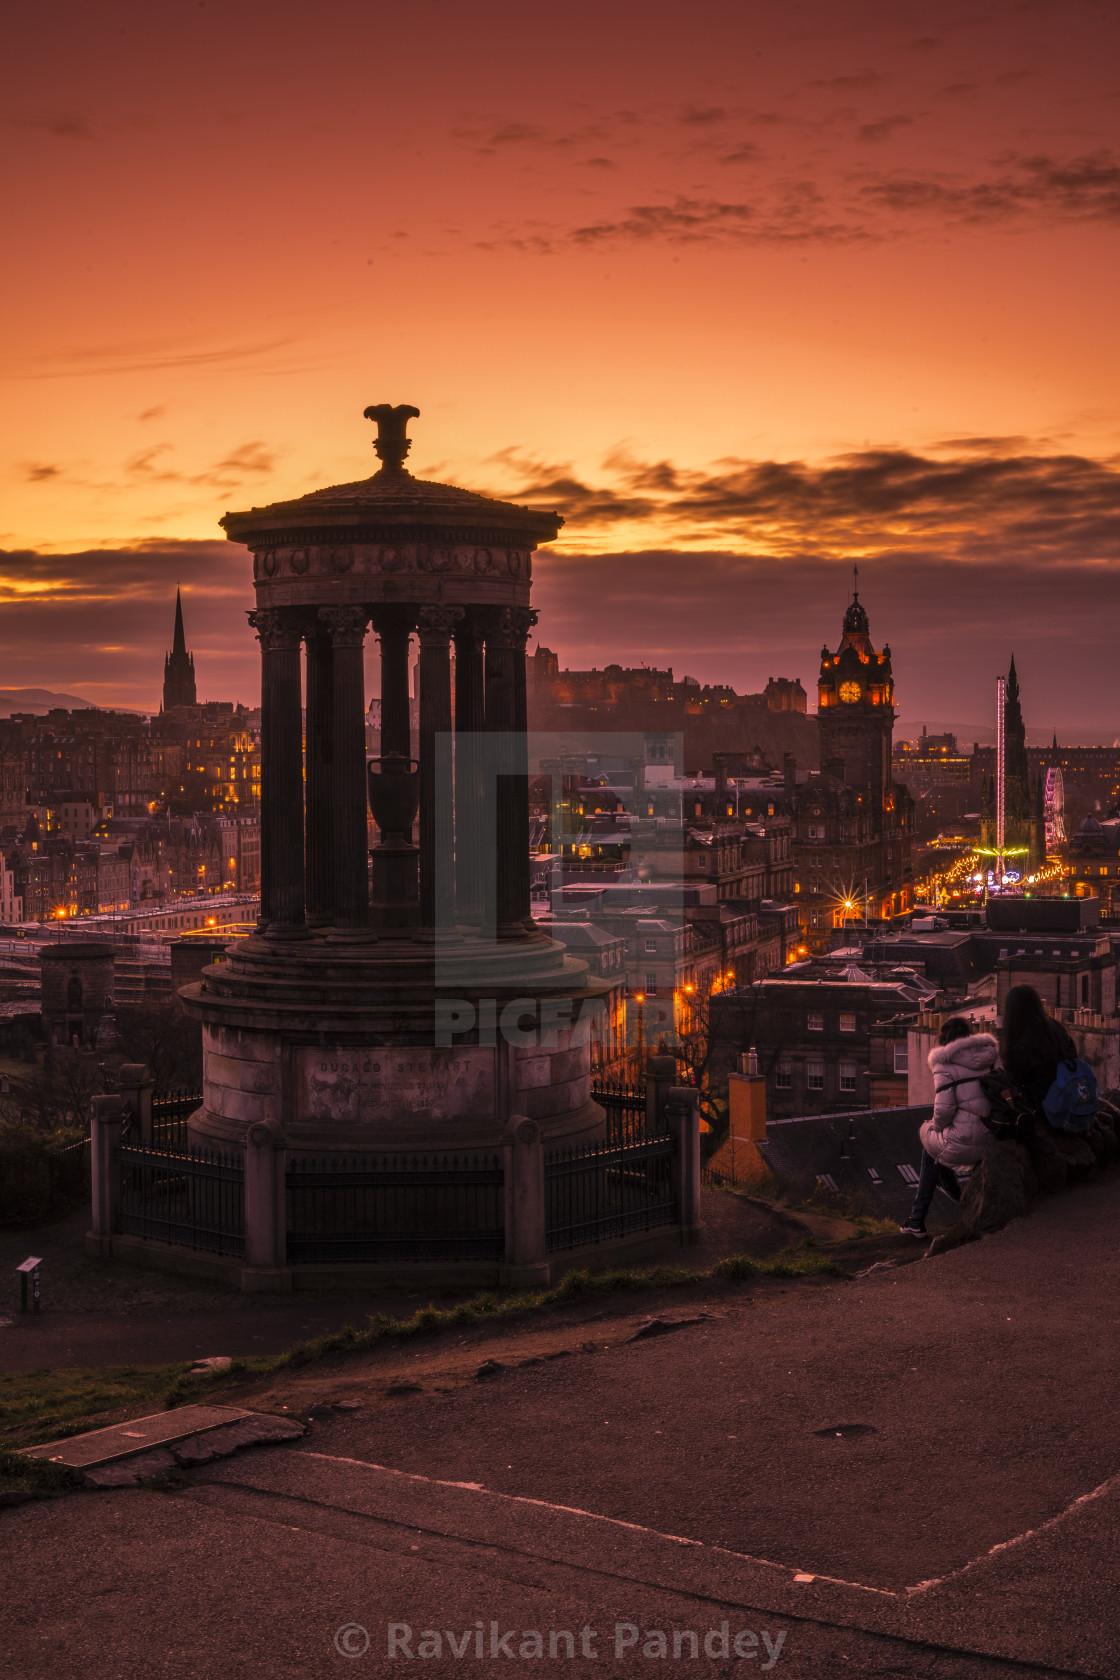 """Amazing sunset view from Calton Hill overlooking city centre, Edinburgh - Scotland"" stock image"